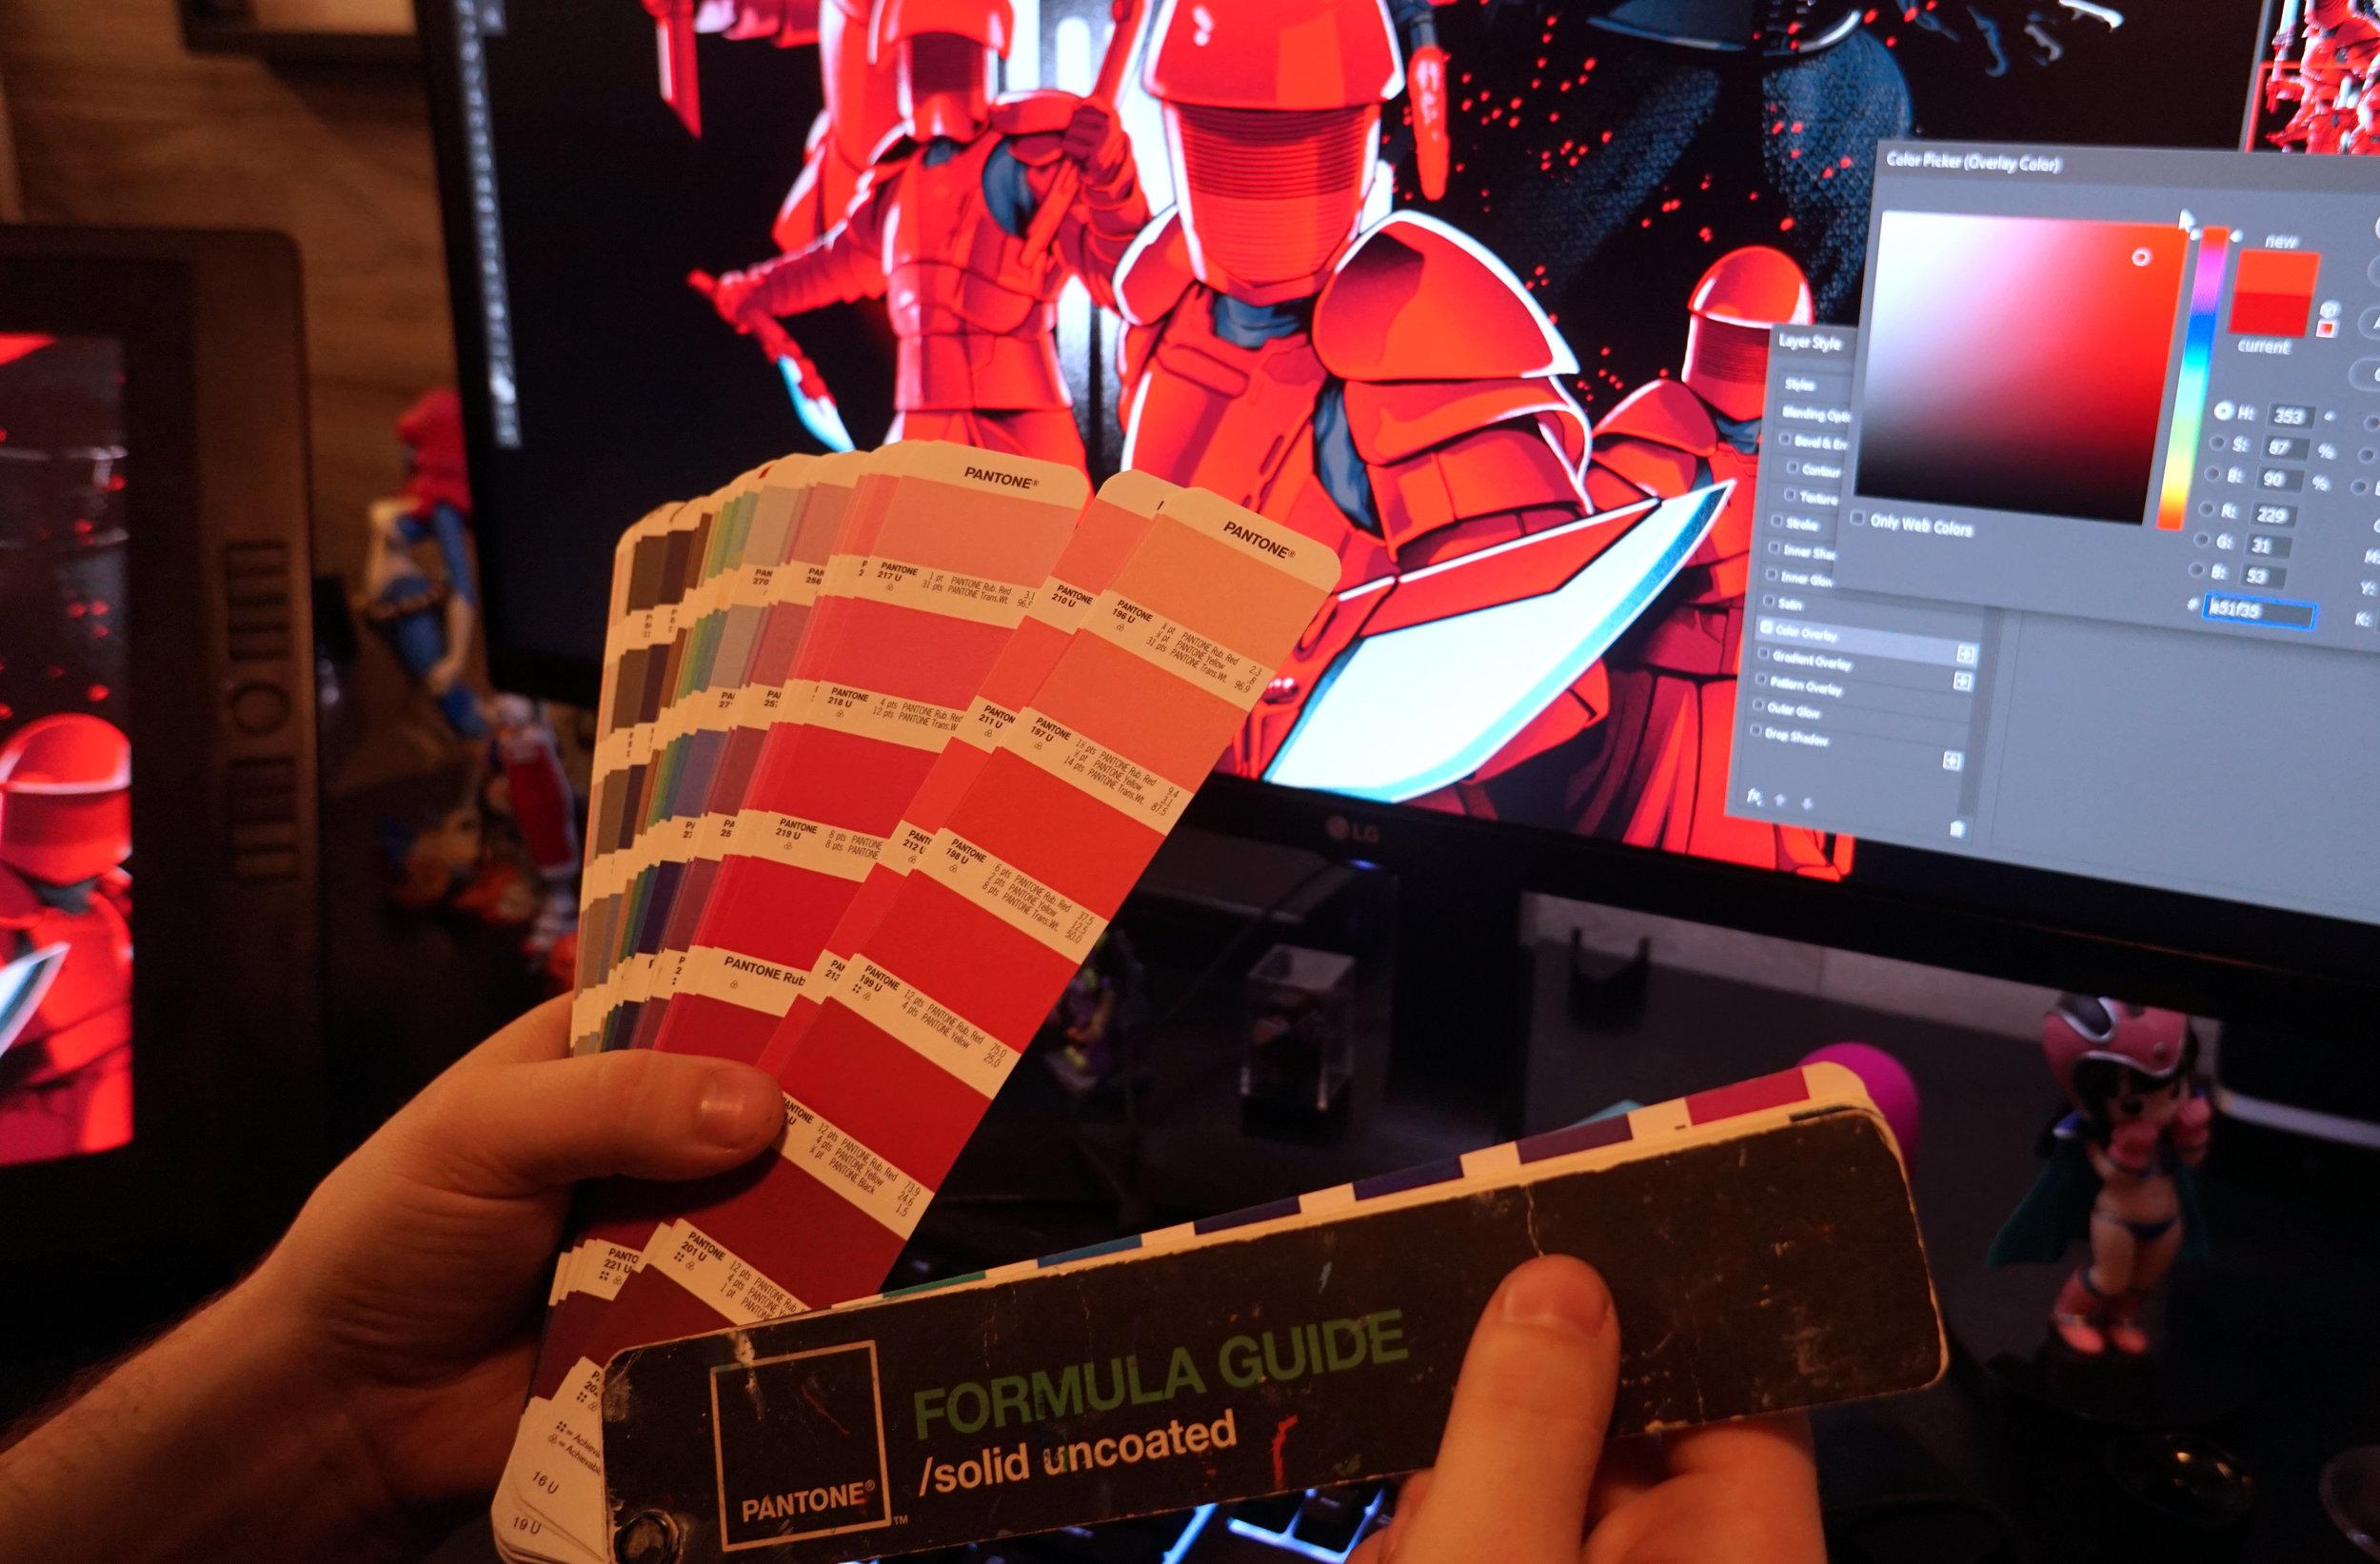 Iaccarino Star Wars Acme promo (2).jpg